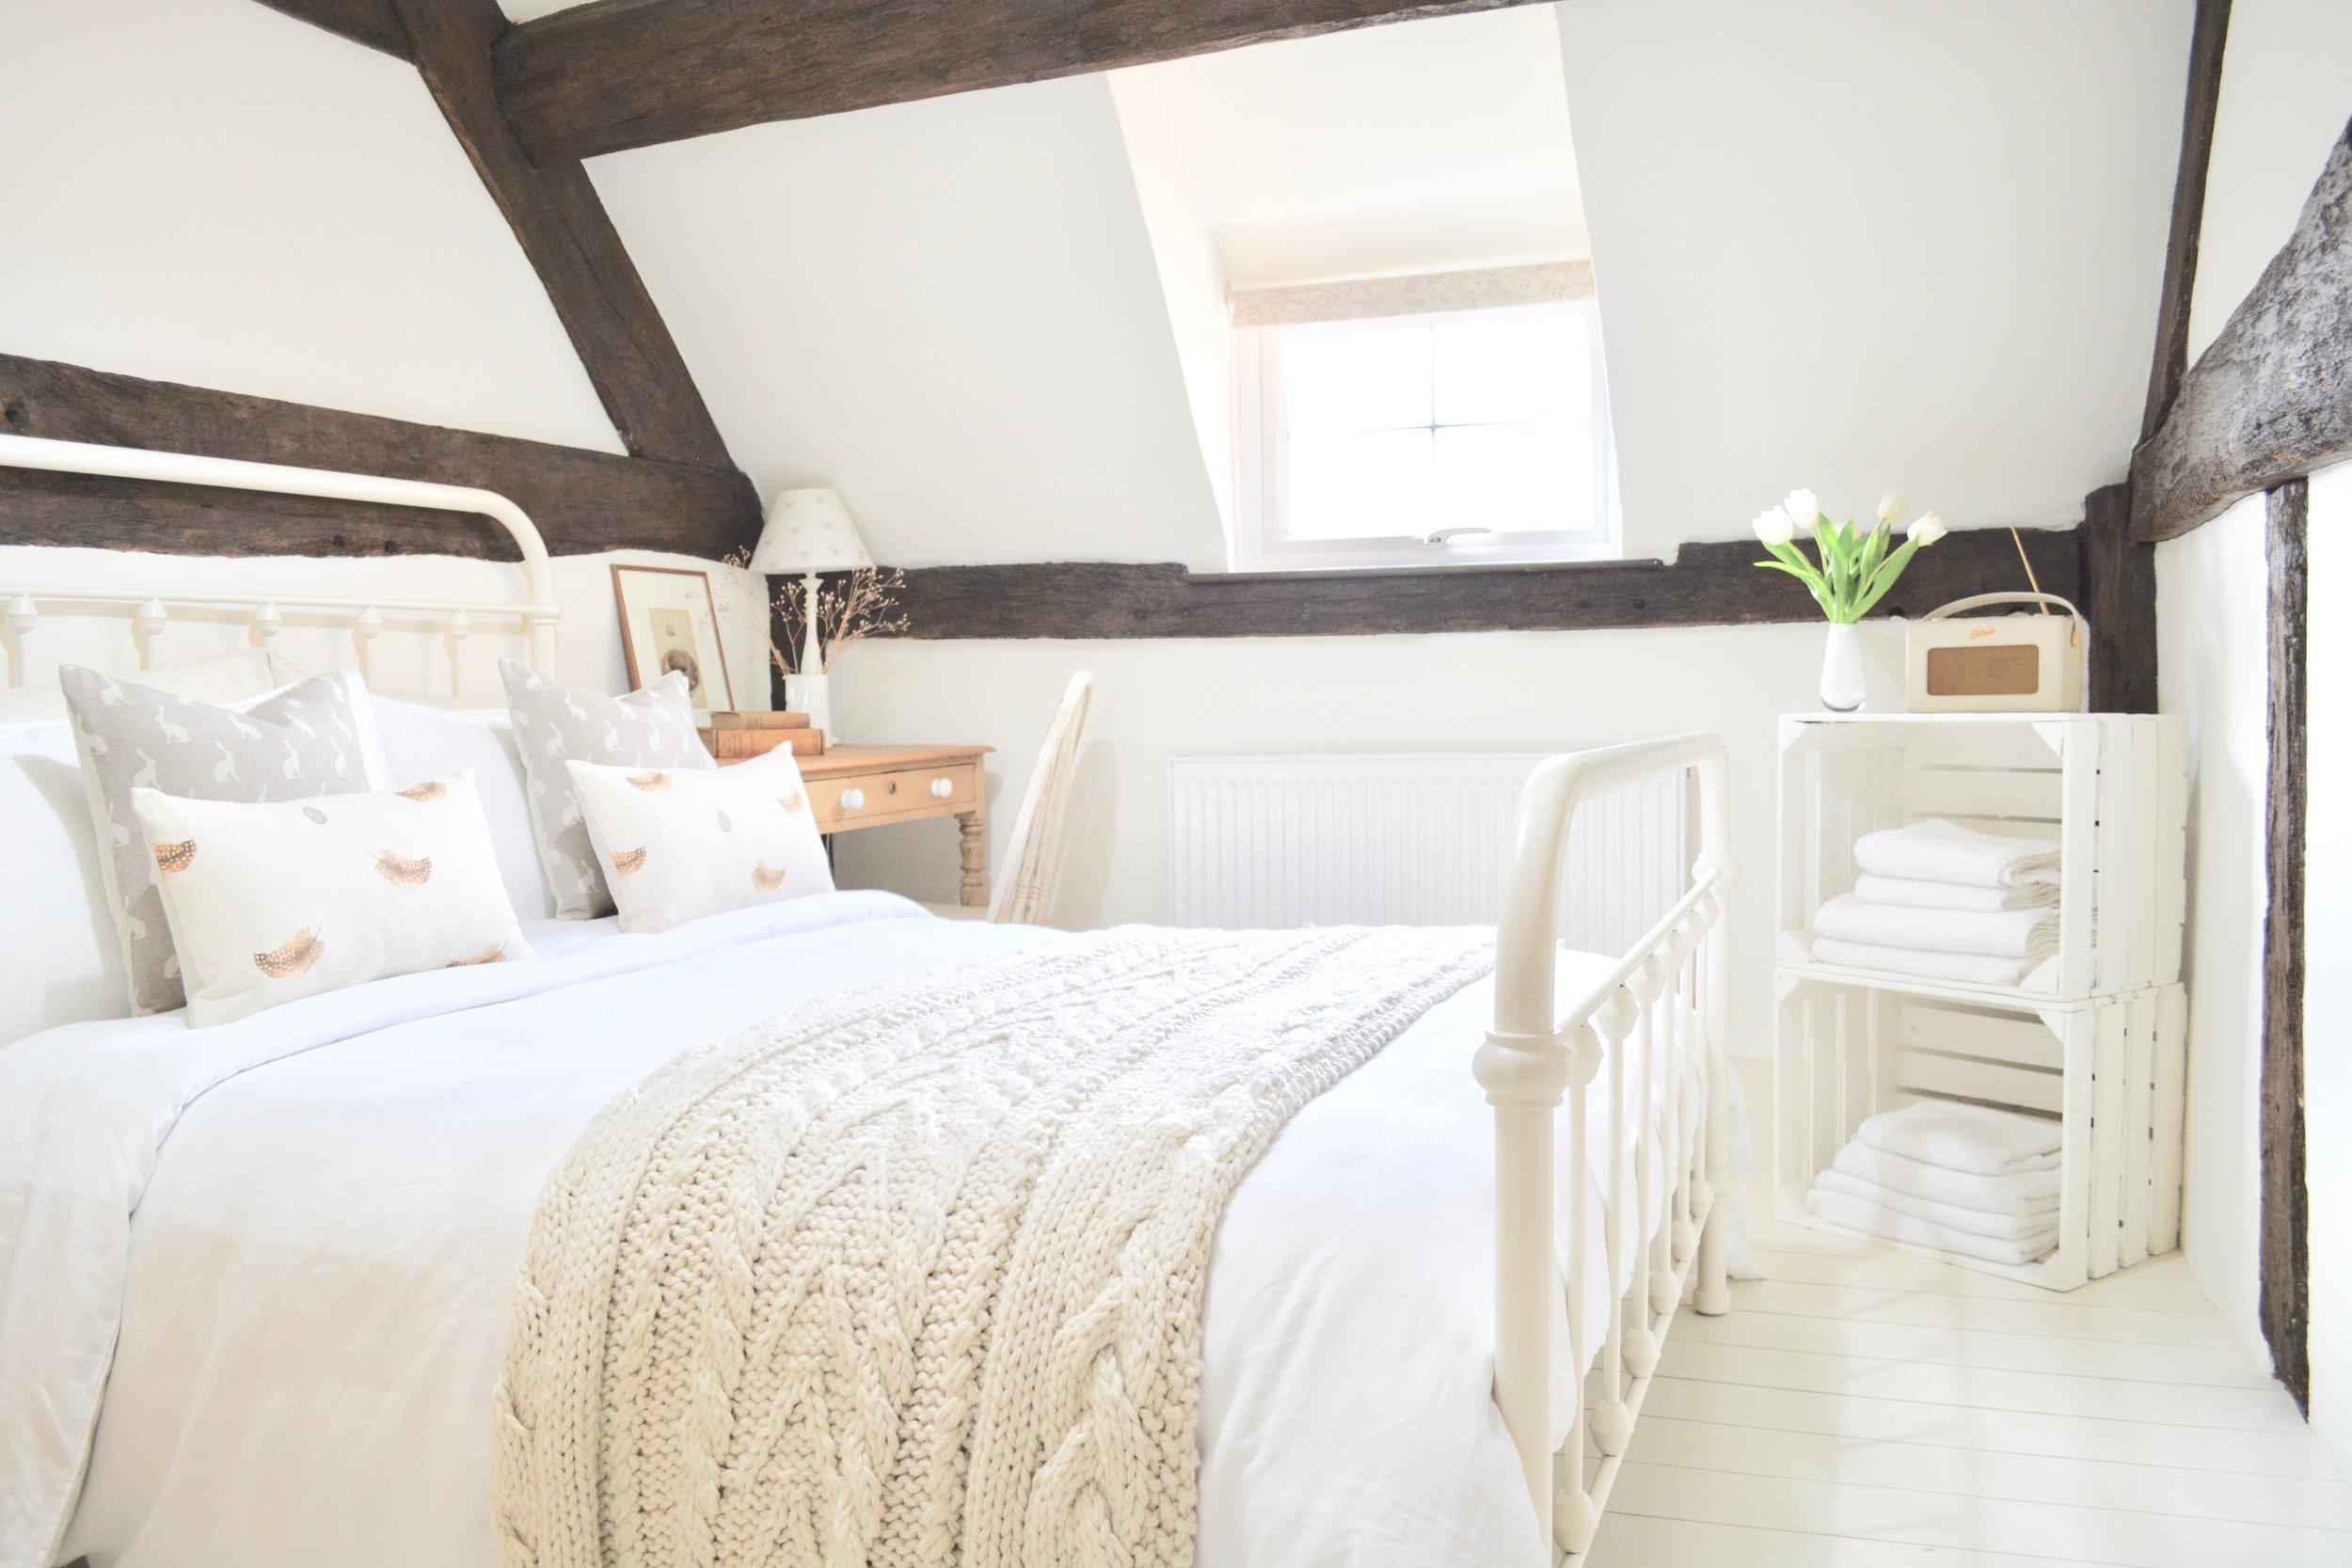 Black & White Cottage Bedroom Designed by www.hlinteriors.co.uk3.jpg